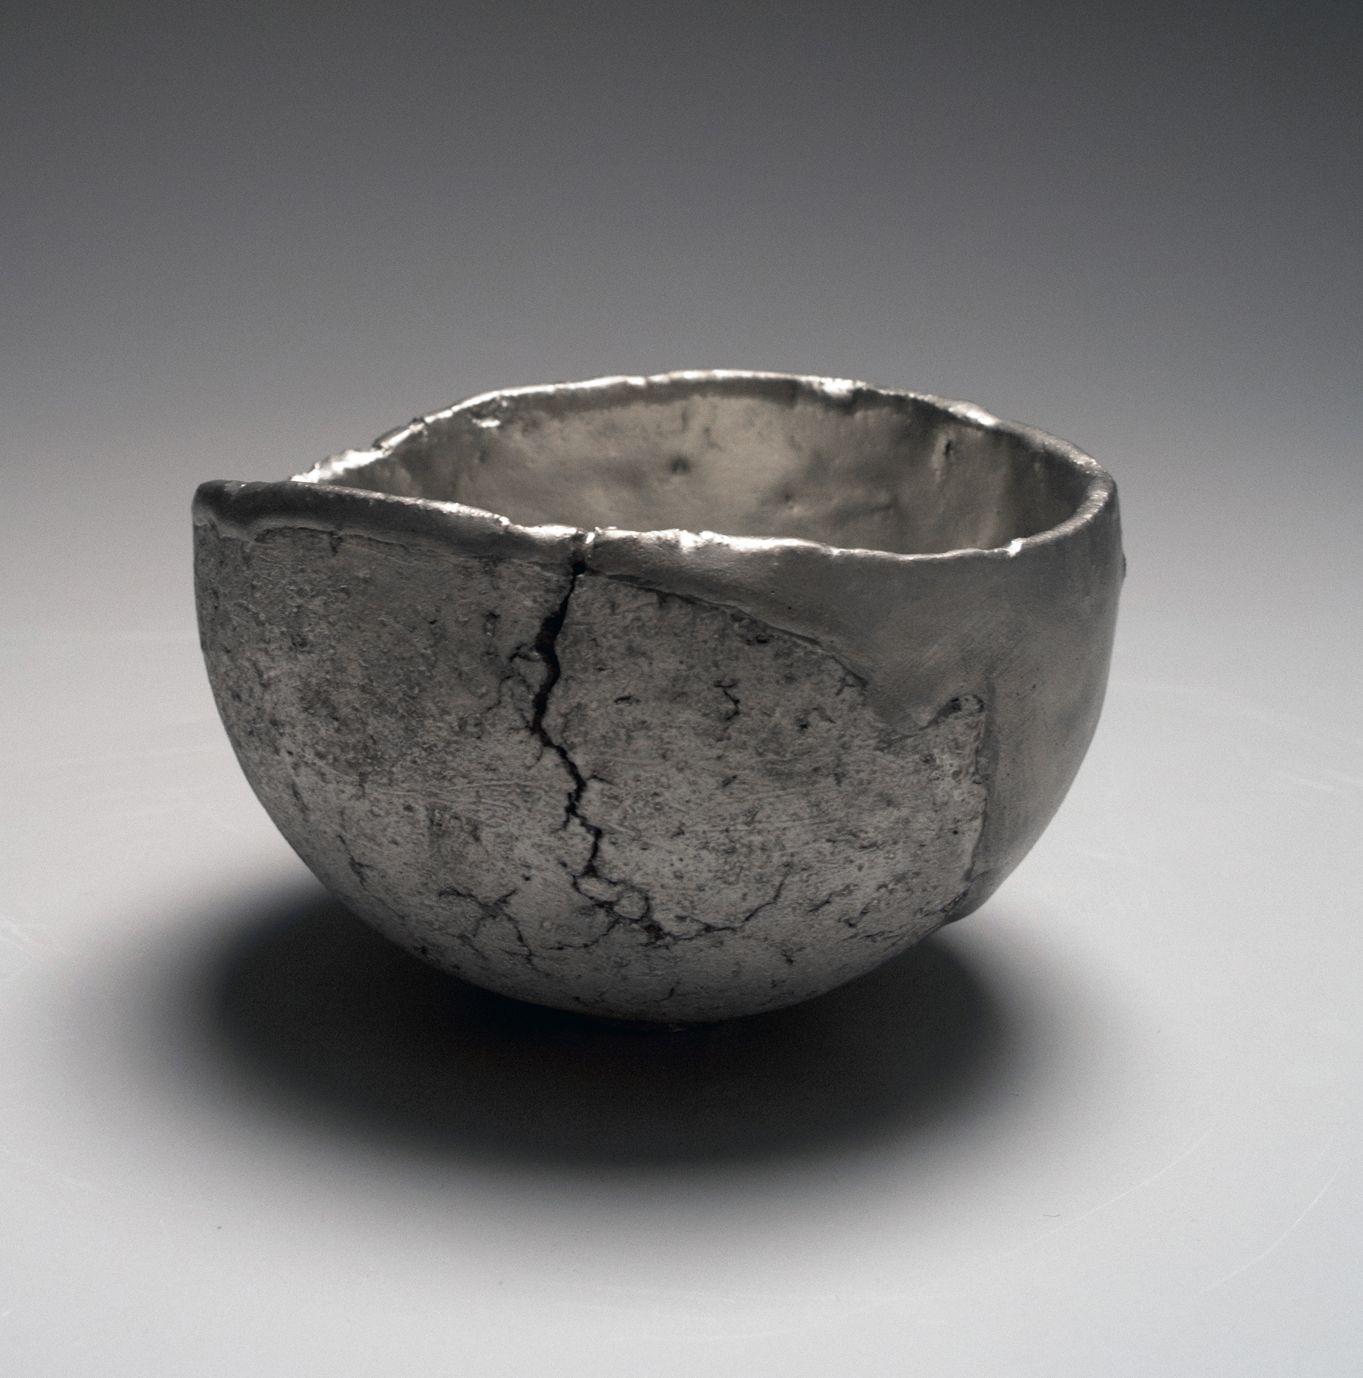 Ogawa Machiko (b. 1946), Teabowl